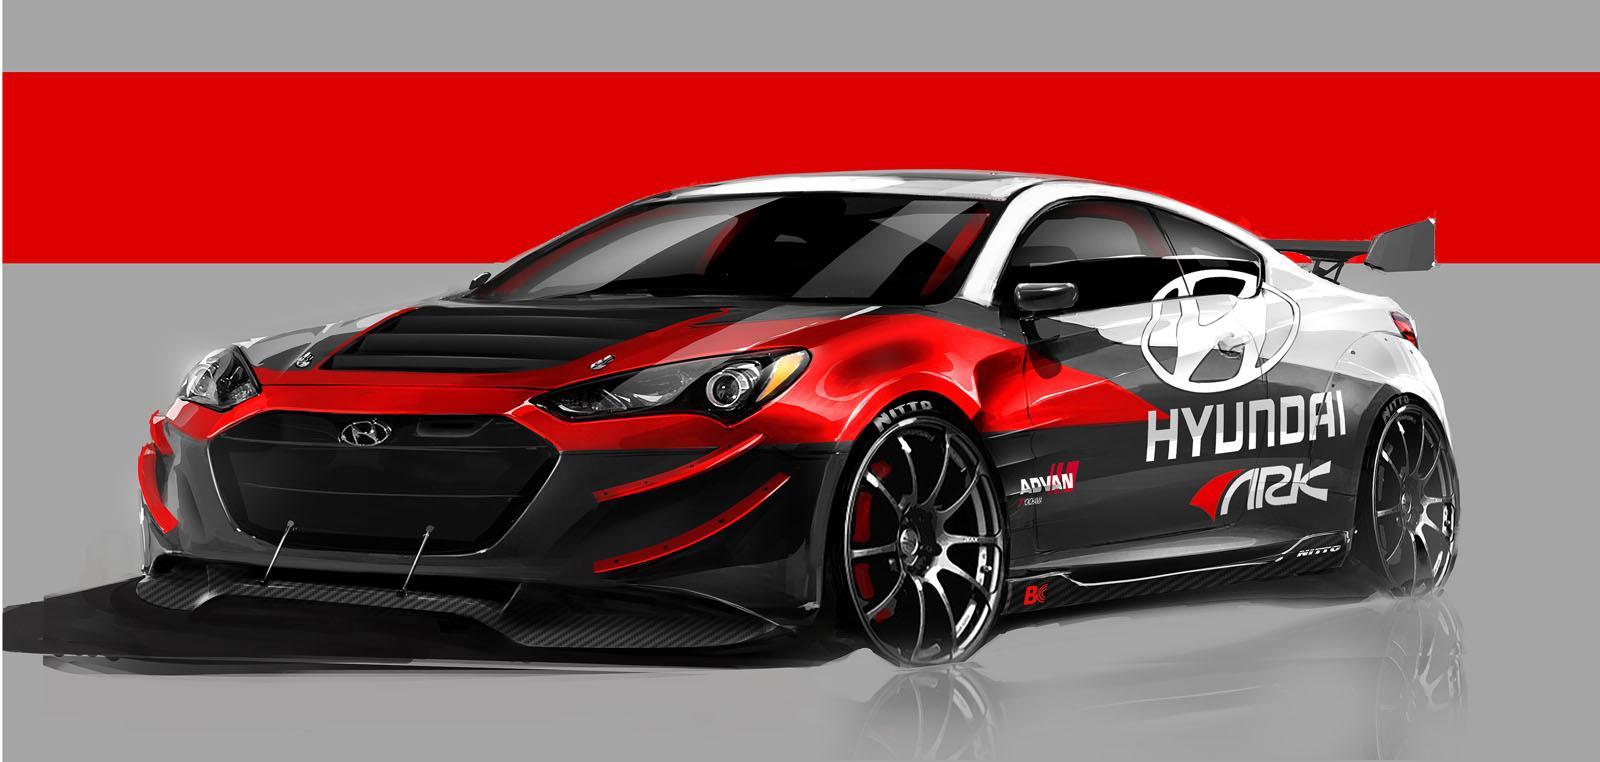 Hyundai Genesis Coupe R-Spec Track Edition